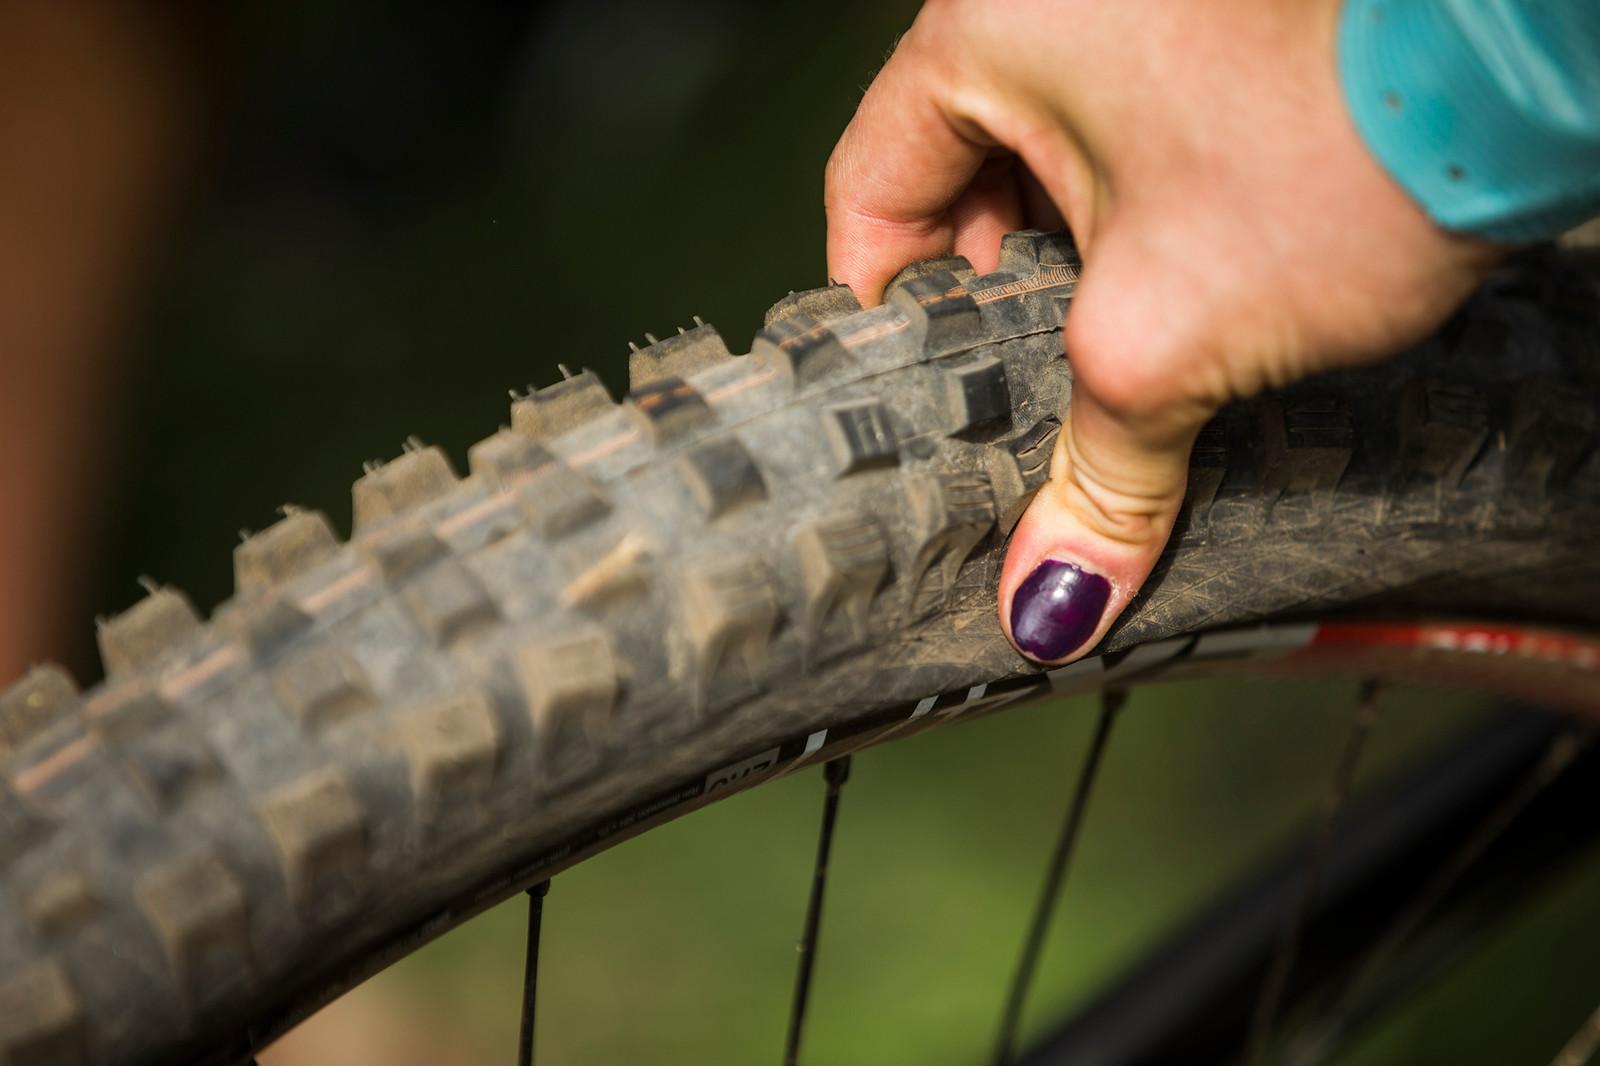 Tahnee Still Won Despite This Much Pressure at the Line - WINNING BIKE: Tahnee Seagrave's Transition TR11 - Mountain Biking Pictures - Vital MTB